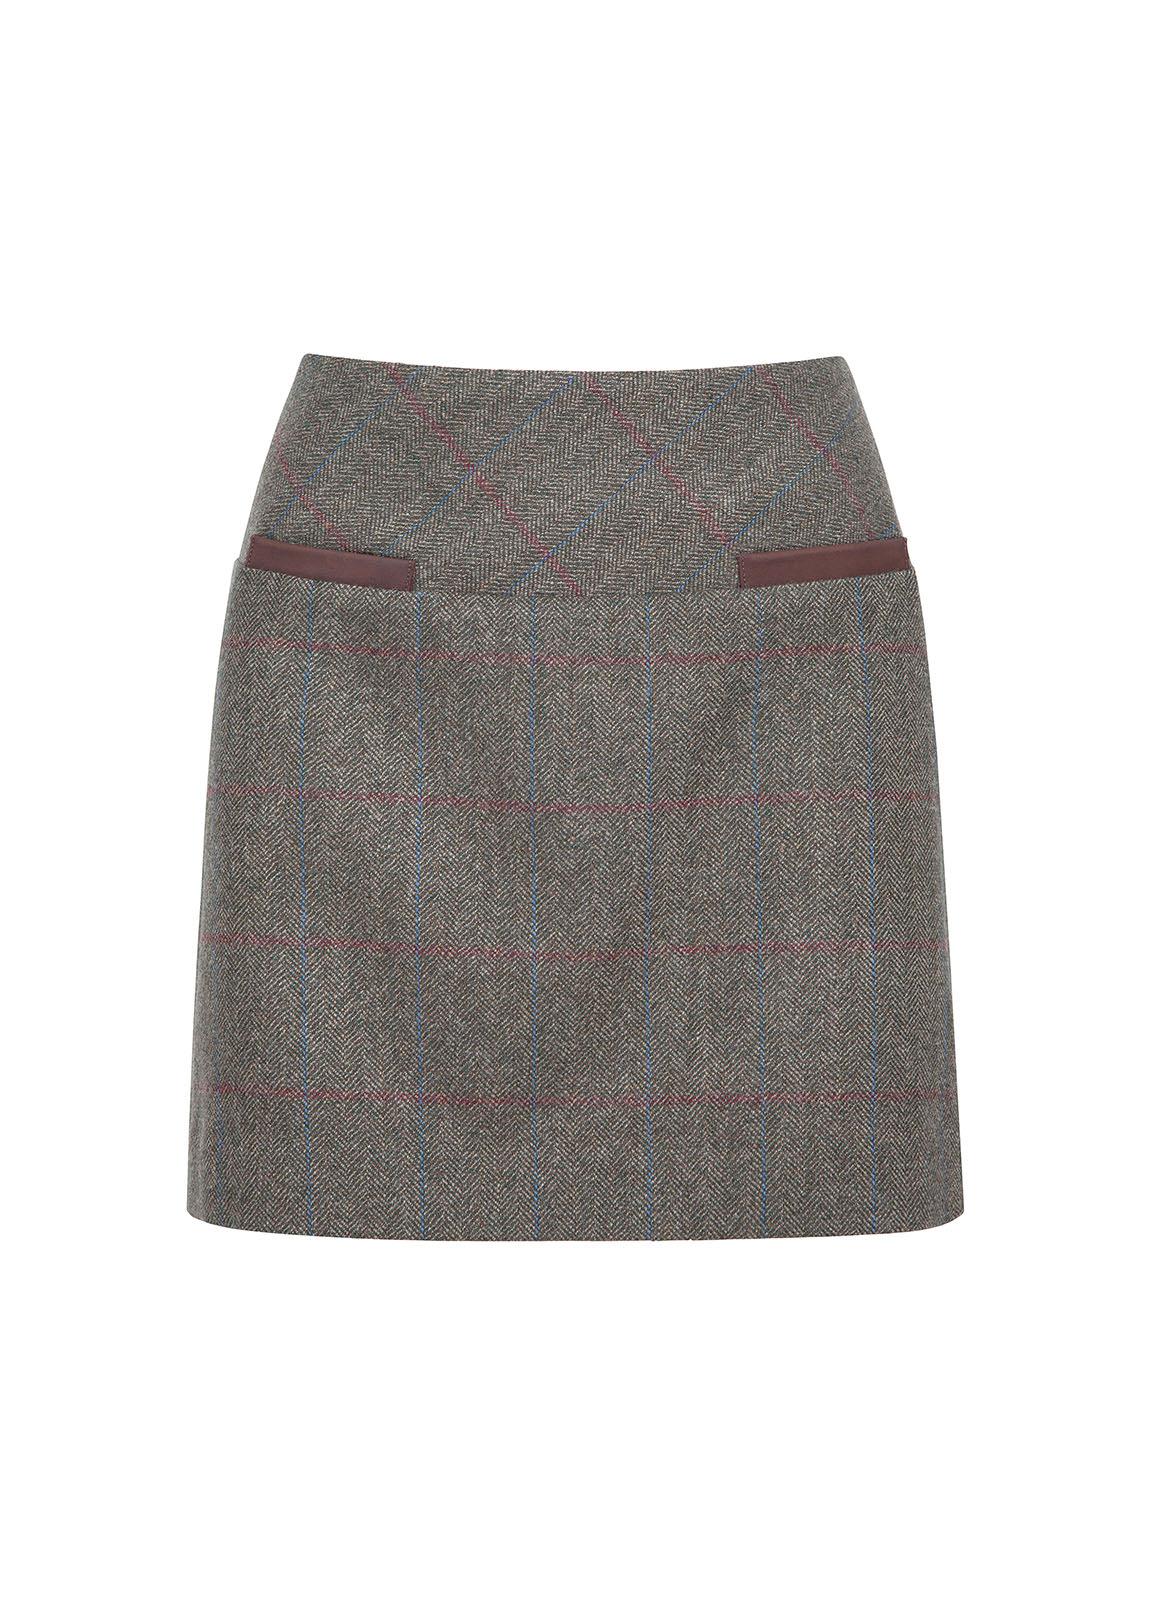 Dubarry_ Clover Tweed Mini Skirt - Moss_Image_2